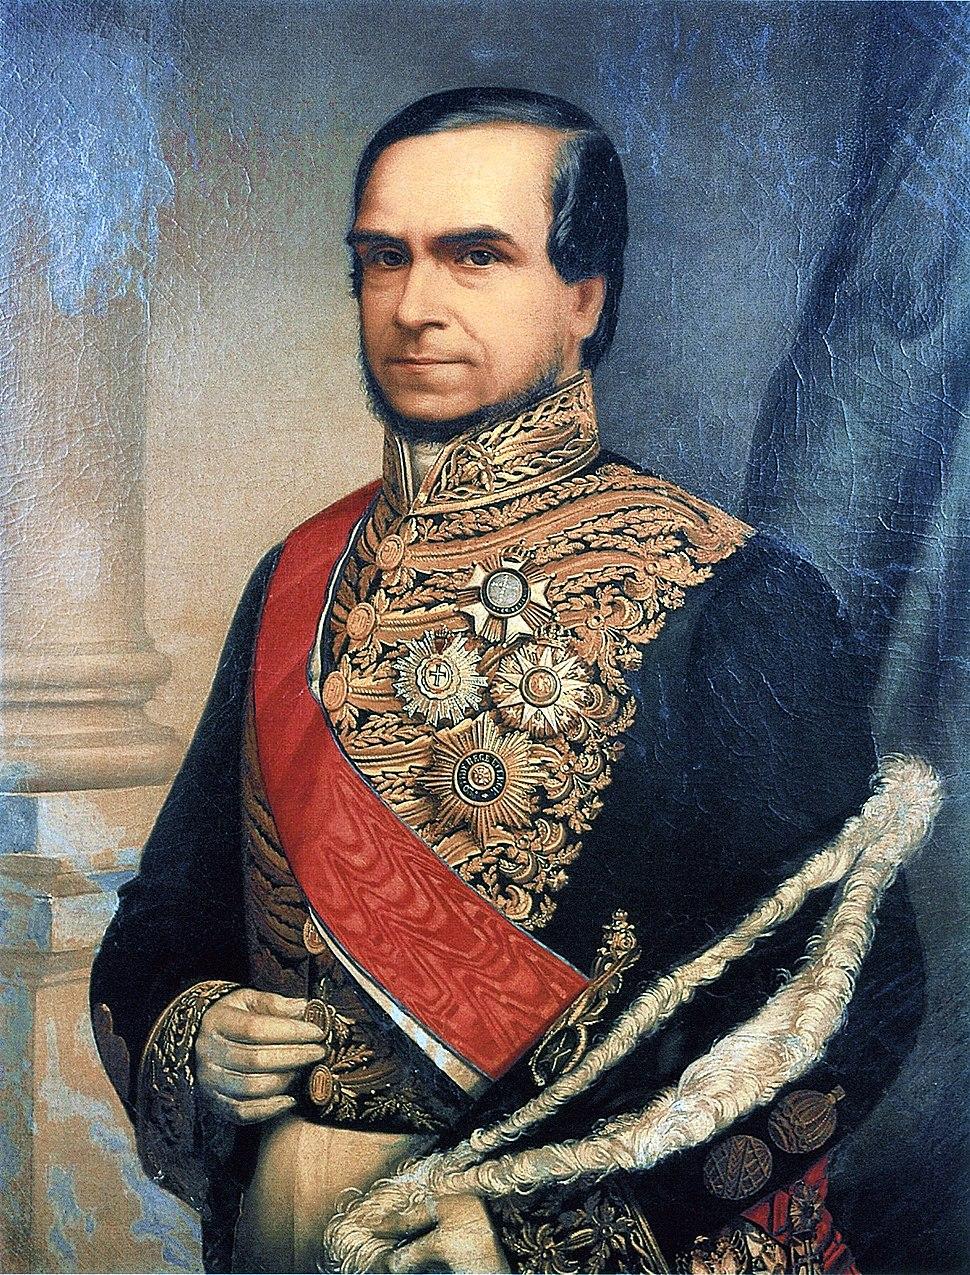 Marquis of Parana by Emilio Bauch